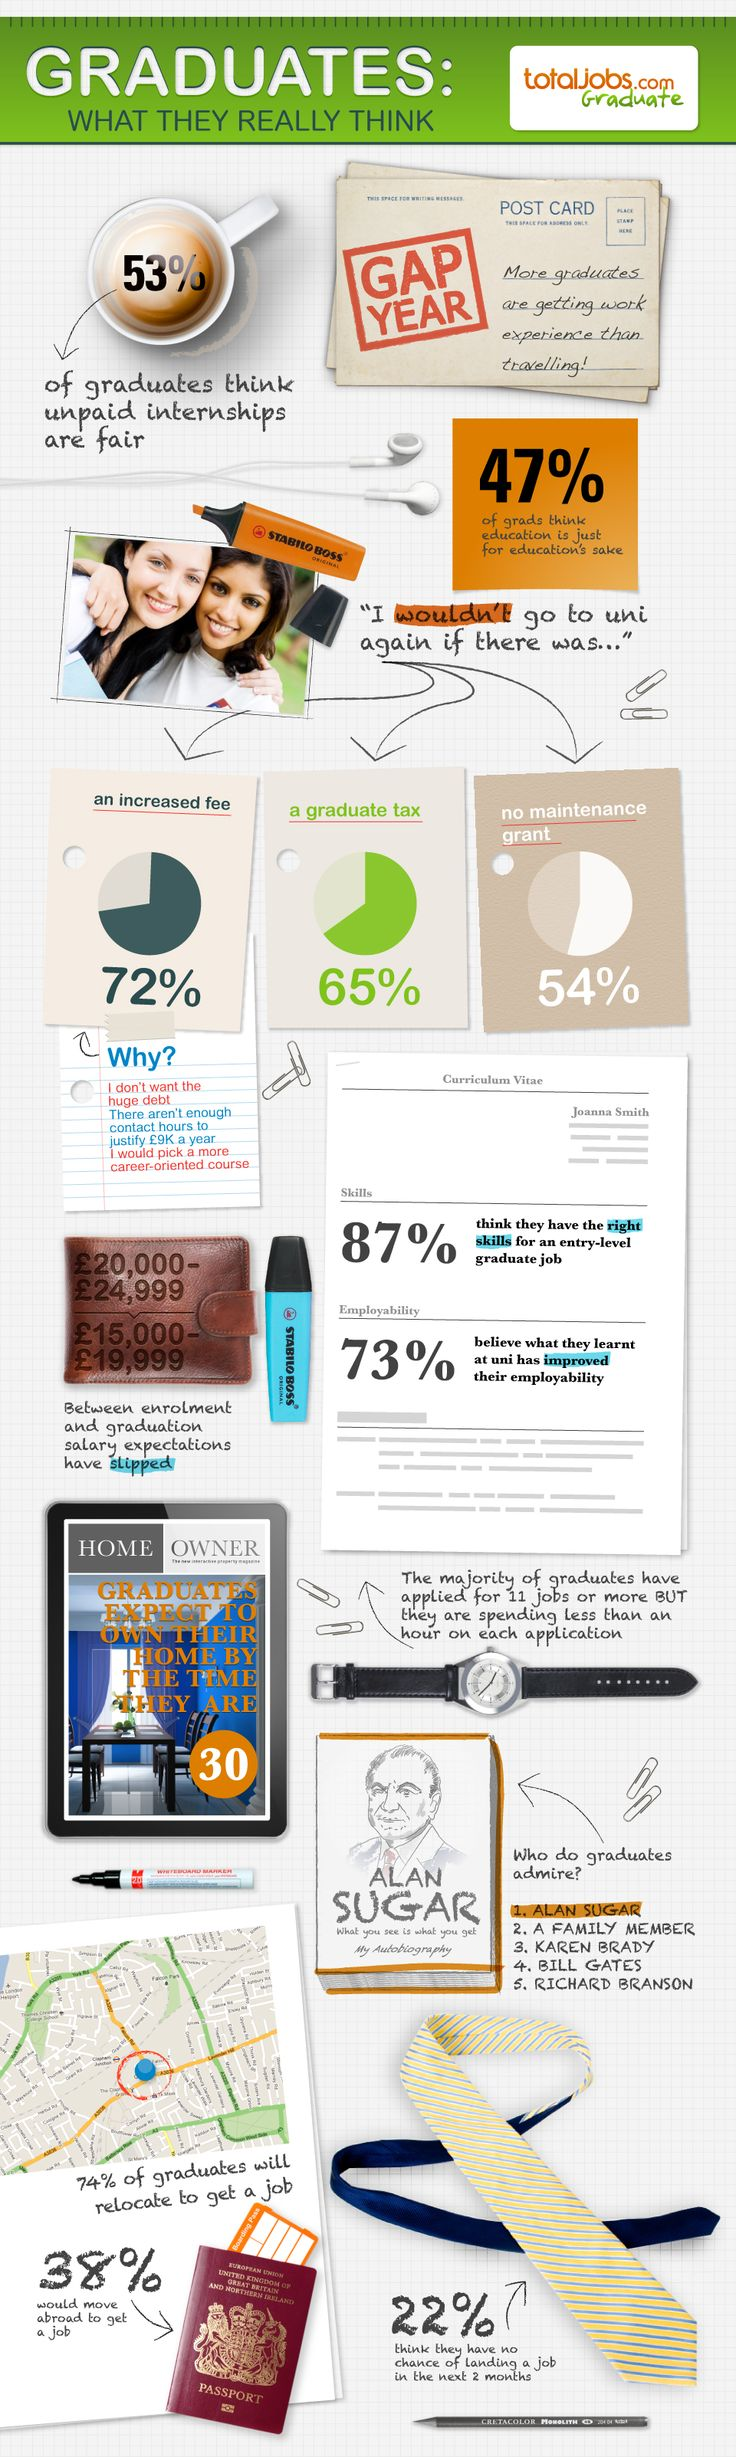 What Do Graduates Really Think? http://www.careergeekblog.com/2011/09/06/graduate-job-thinking-infographic/